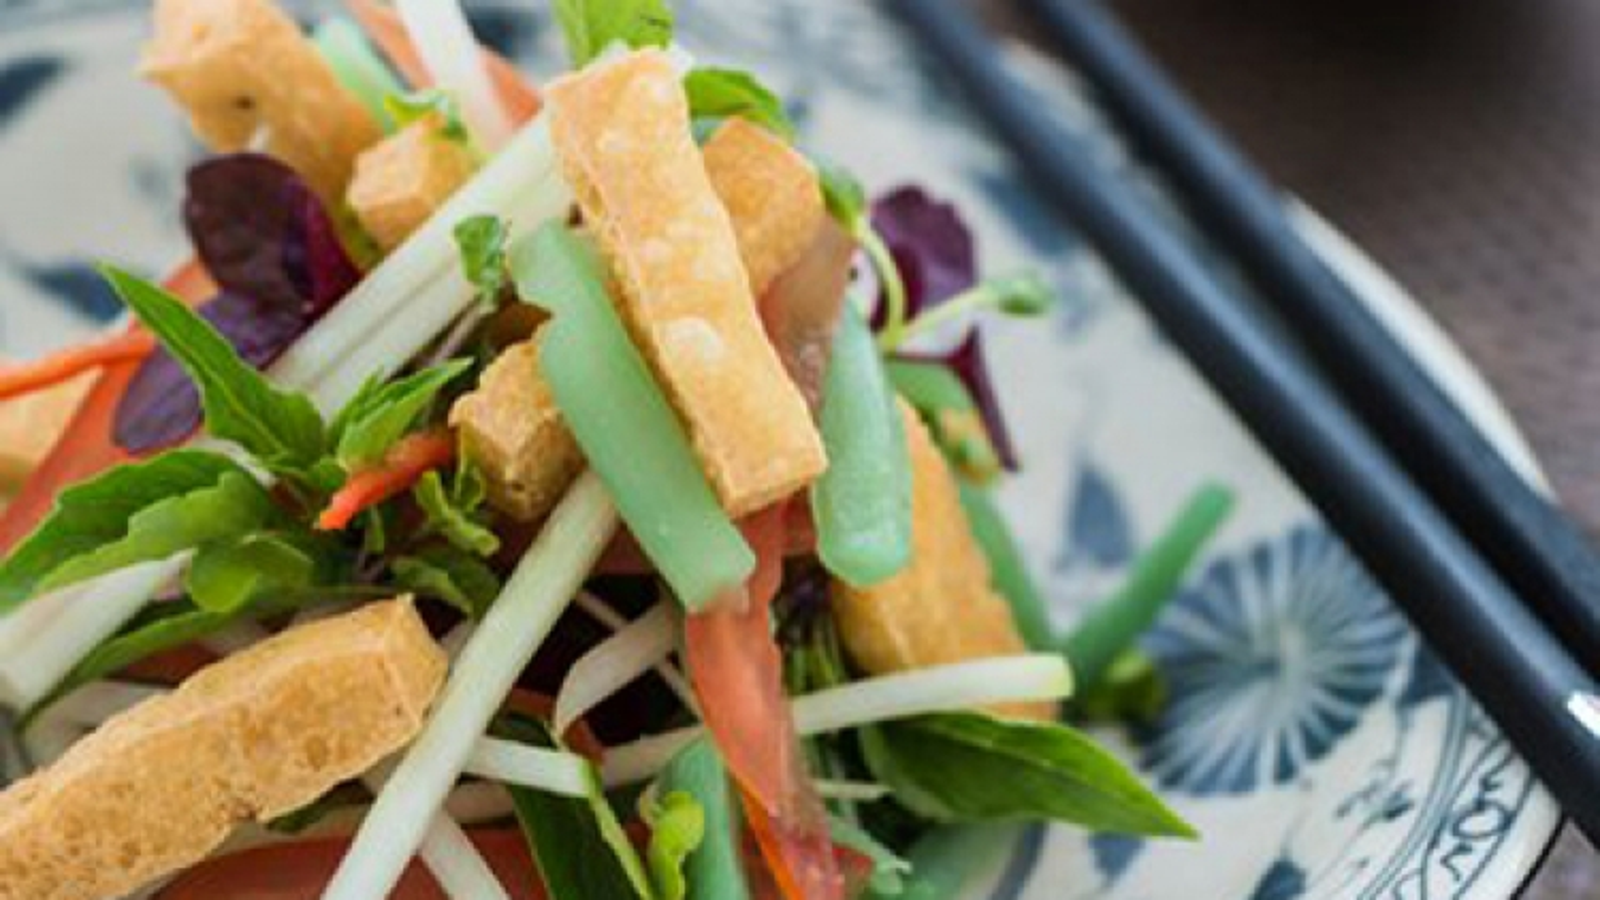 The Nam Hai Hoi An introduces Hue specialties' recipes